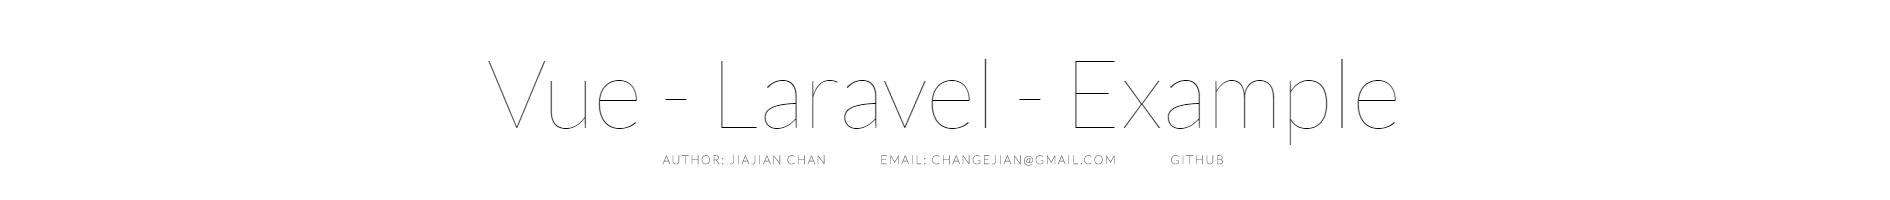 vue-laravel-example